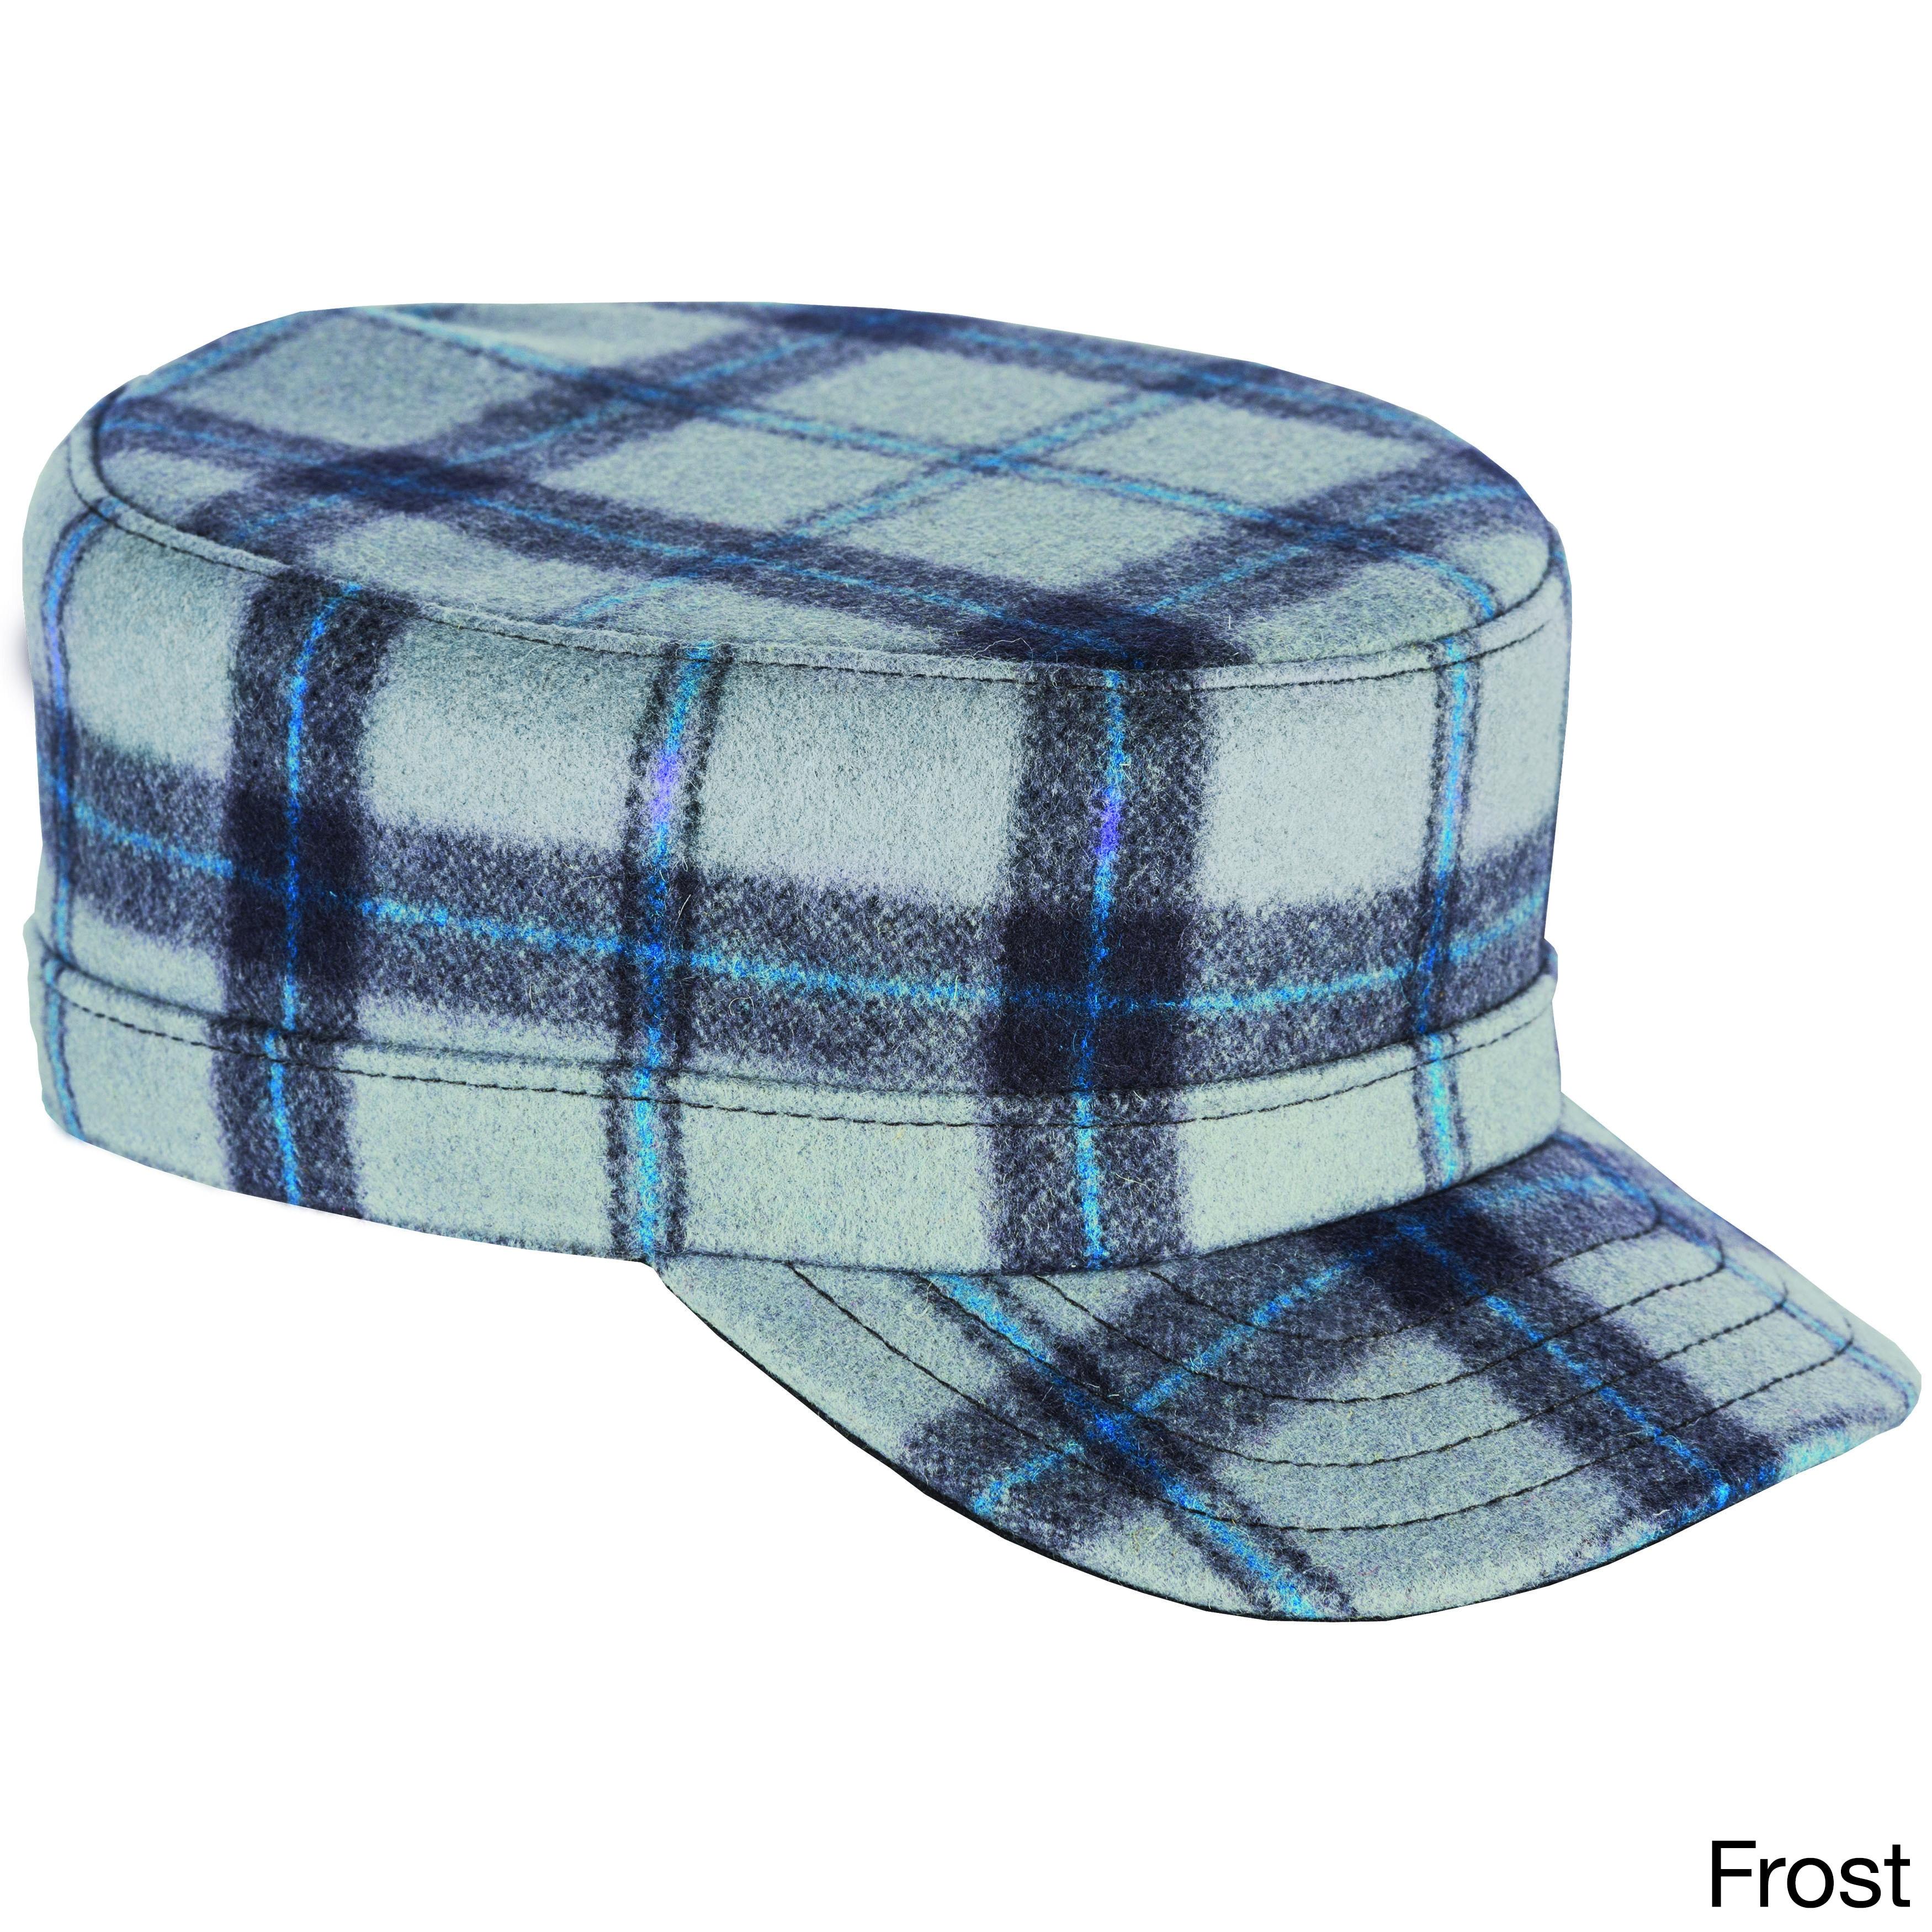 Stormy Kromer 'The Flat Top' Hat (Frost Size 7 3/4), Men'...